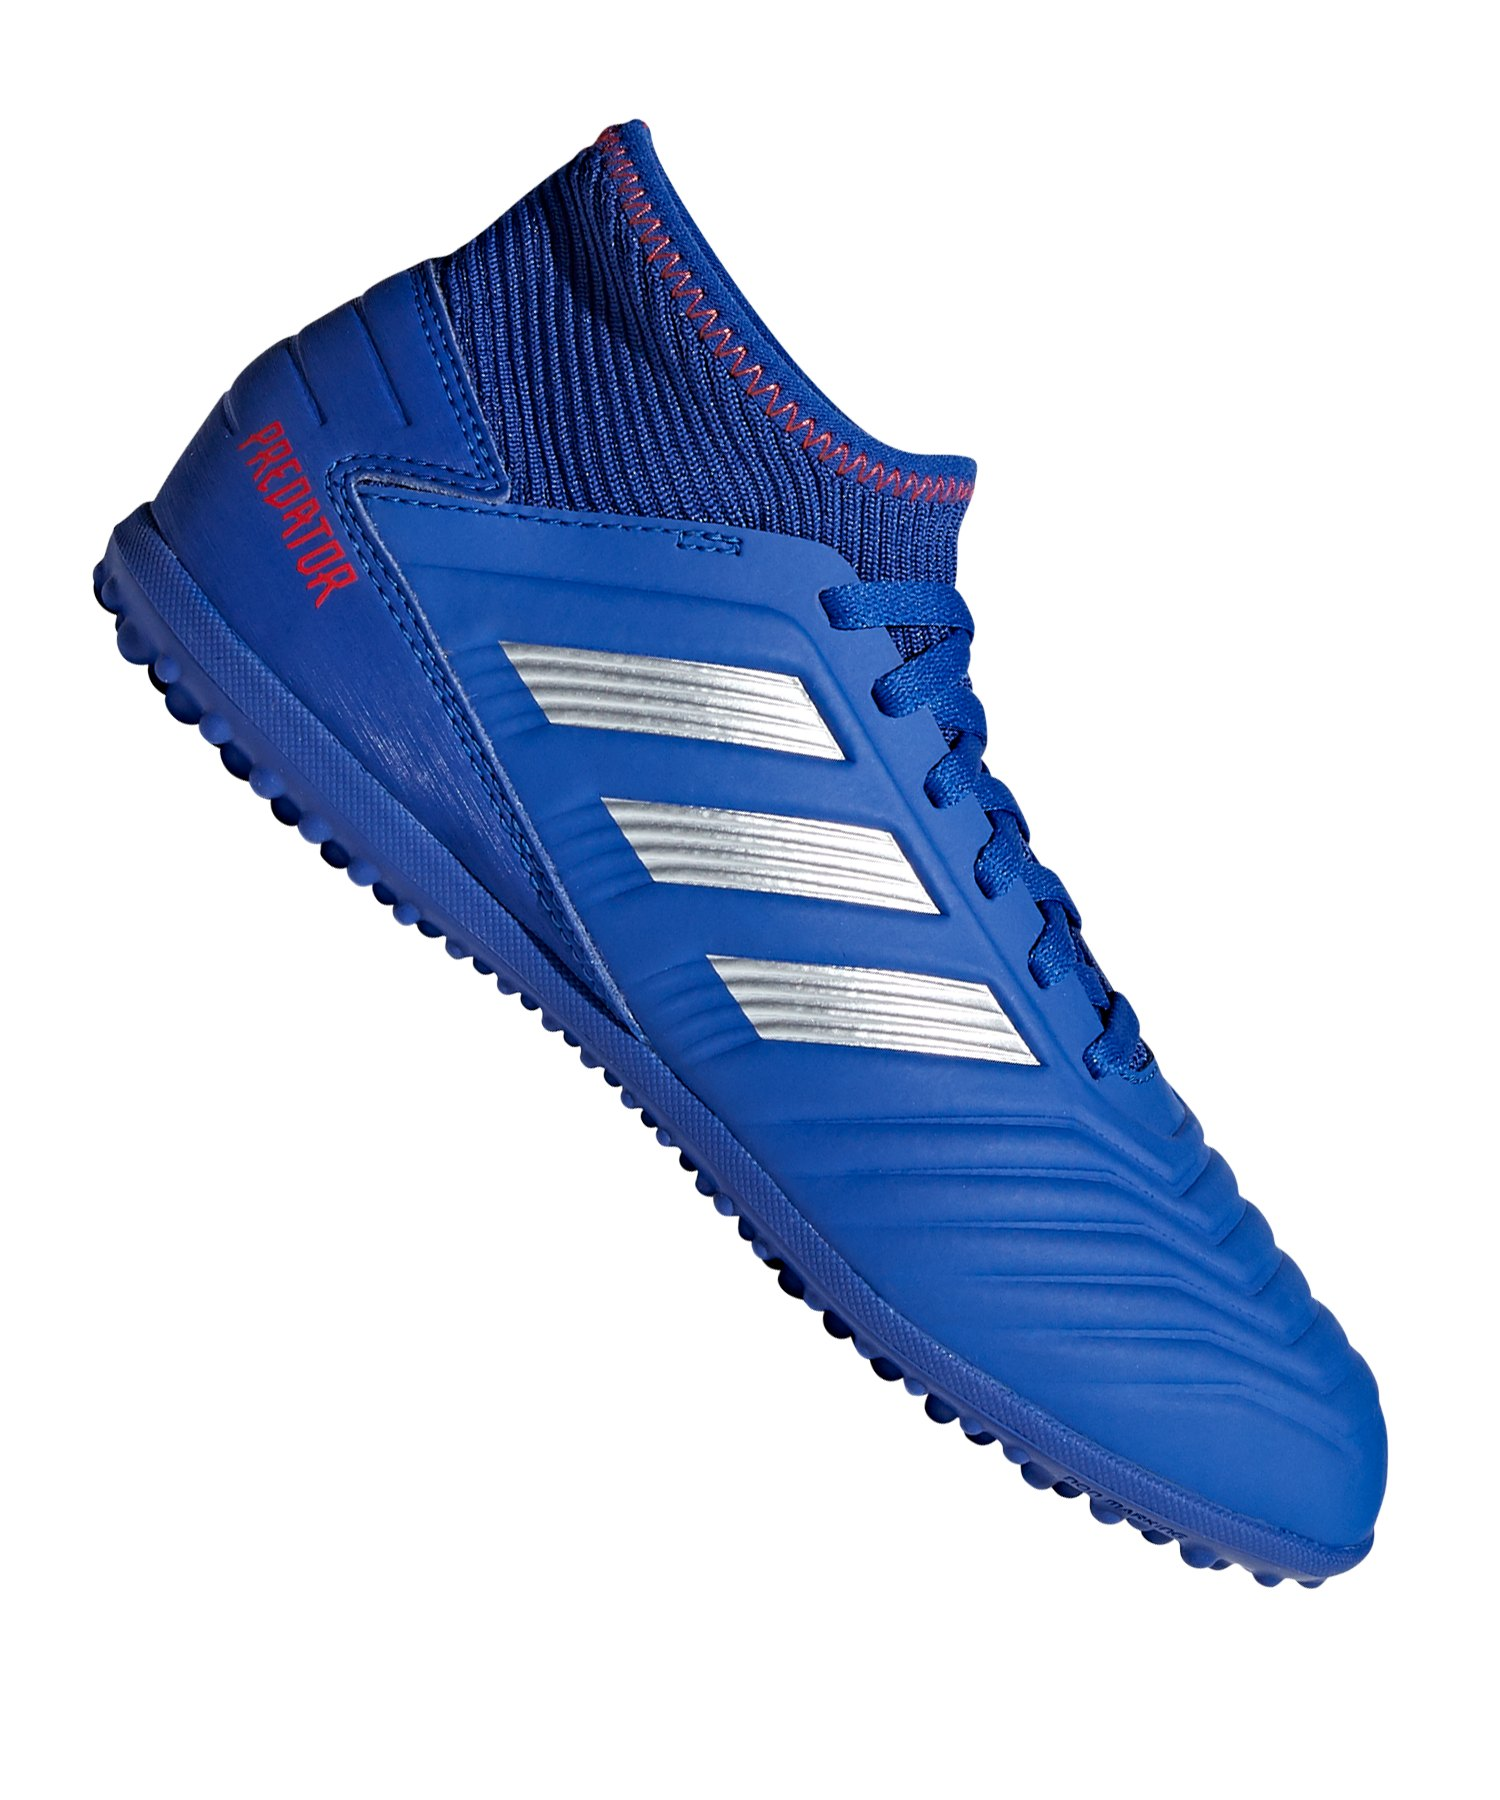 adidas Predator 19.3 TF J Kids Blau Silber - blau